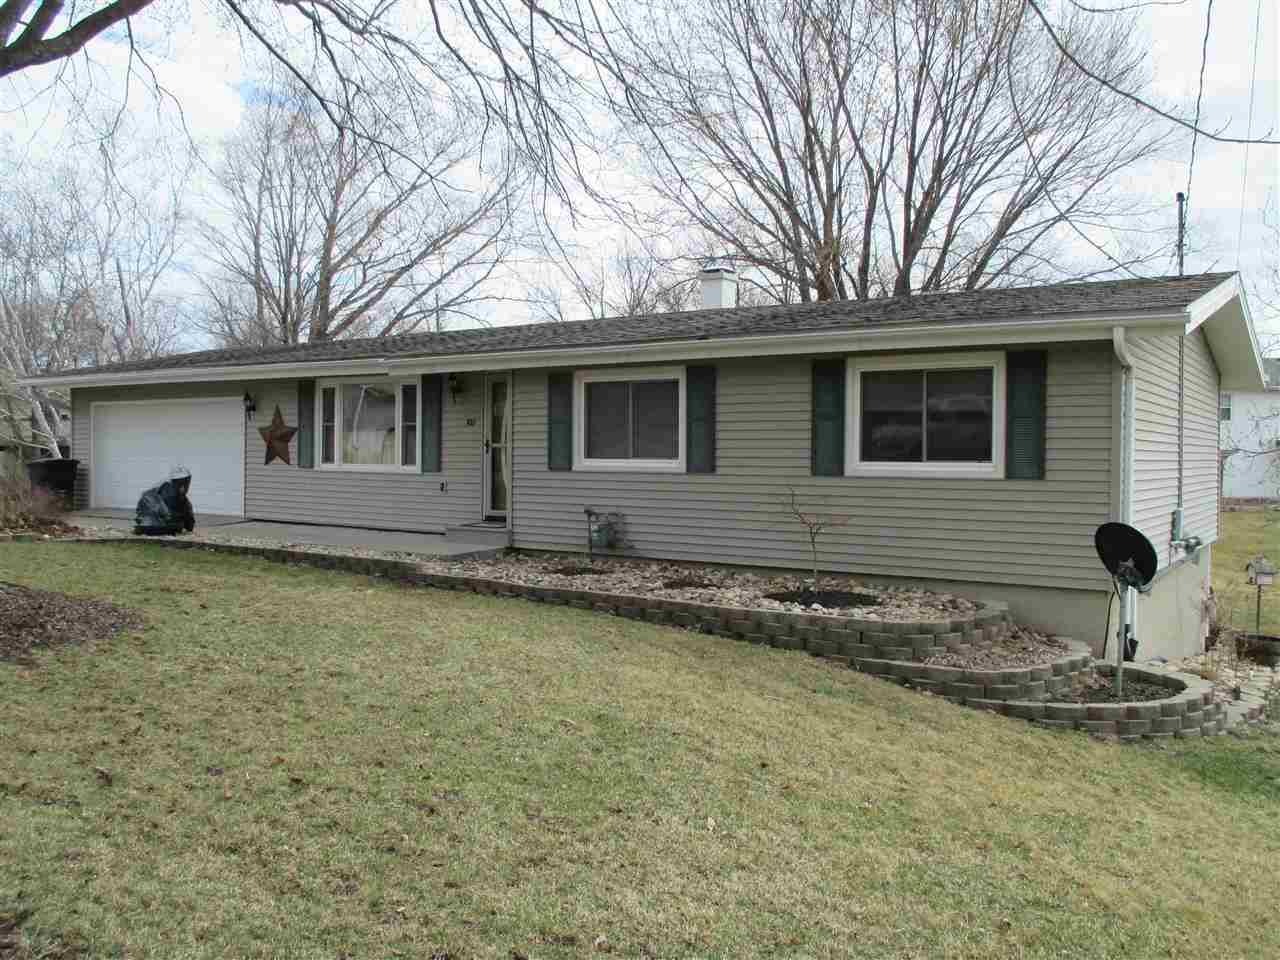 Real Estate for Sale, ListingId: 31589857, Orion,IL61273